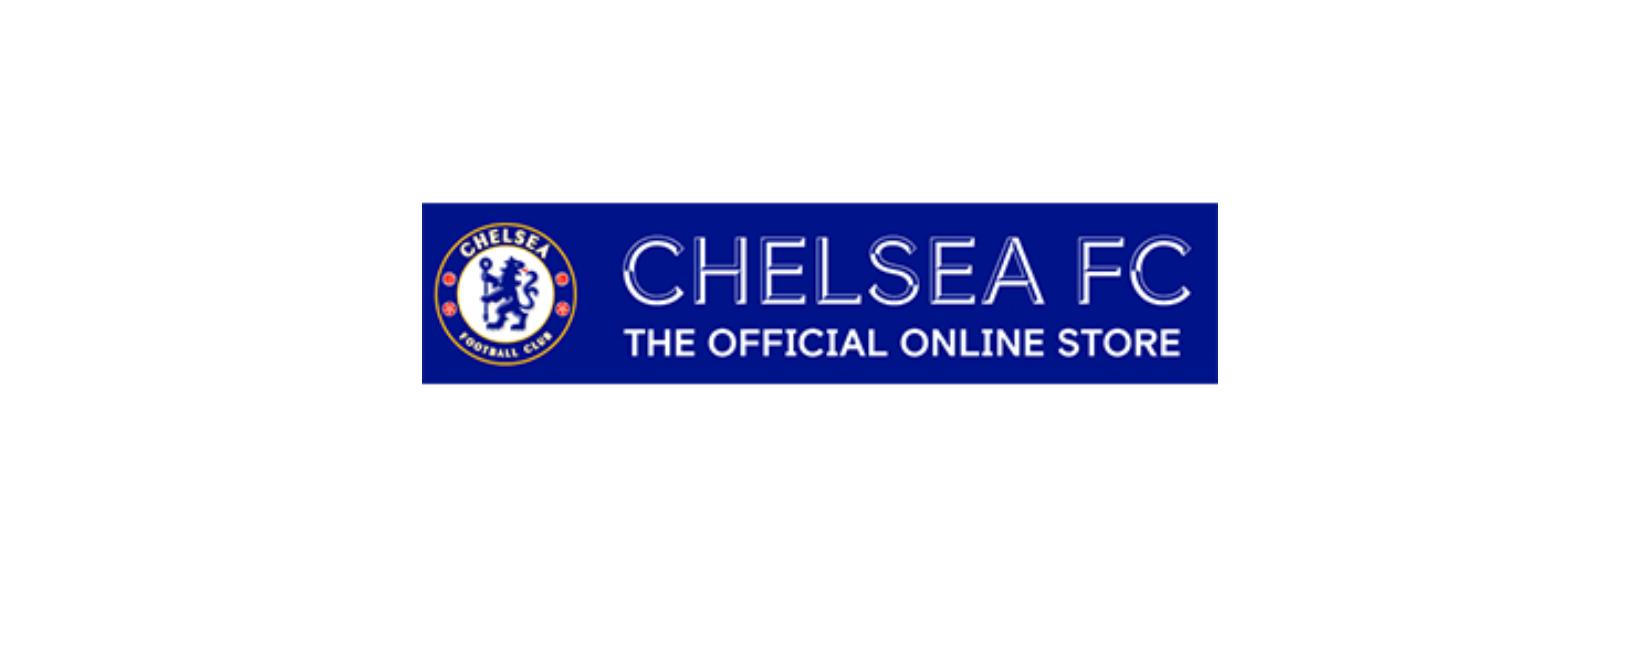 Chelsea Megastore Review – For the Soccer Fanatics